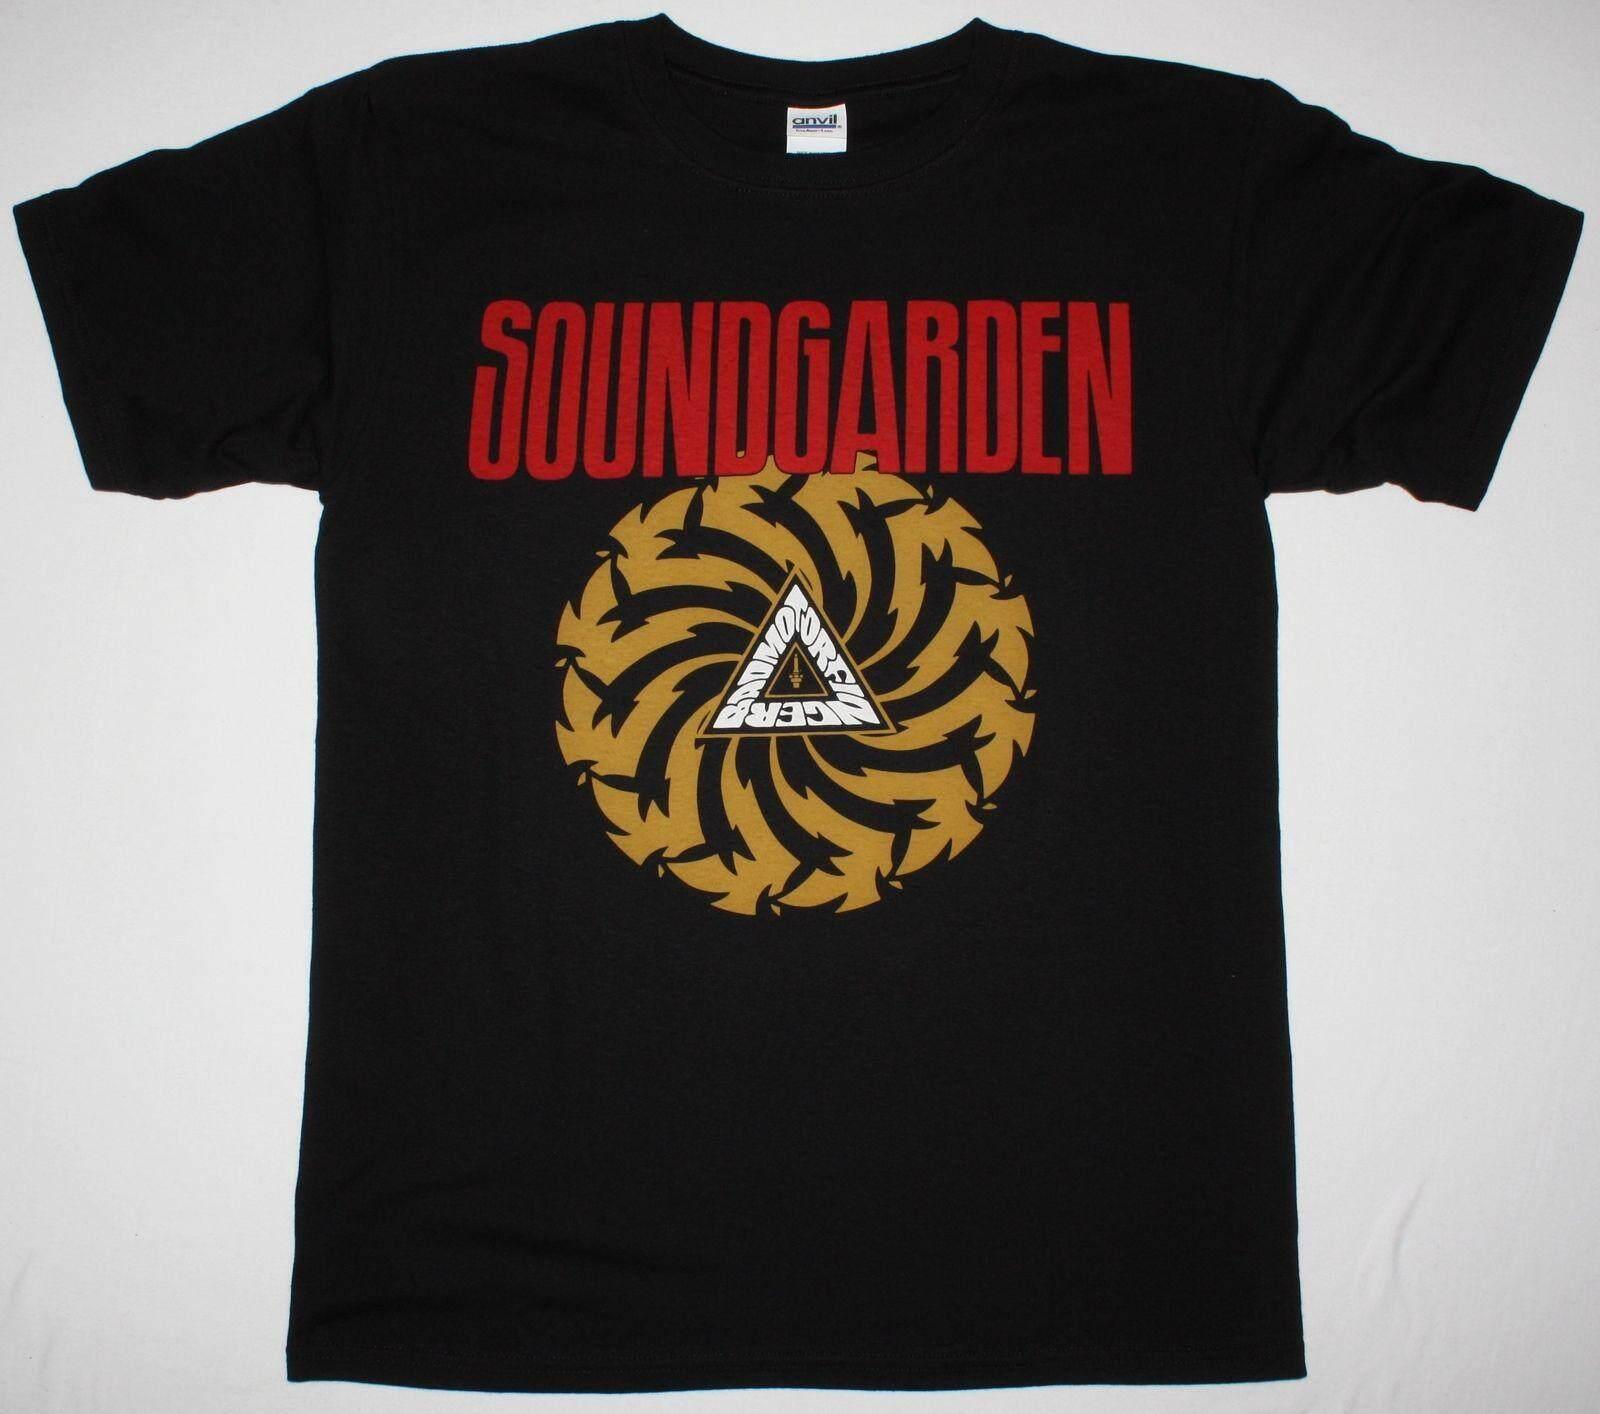 c8eafa34 Soundgarden Badmotorfinger'92 Audioslave Grunge Seattle Band Sports  Bodybuilding Sportswear 100% Cotton Men'S T